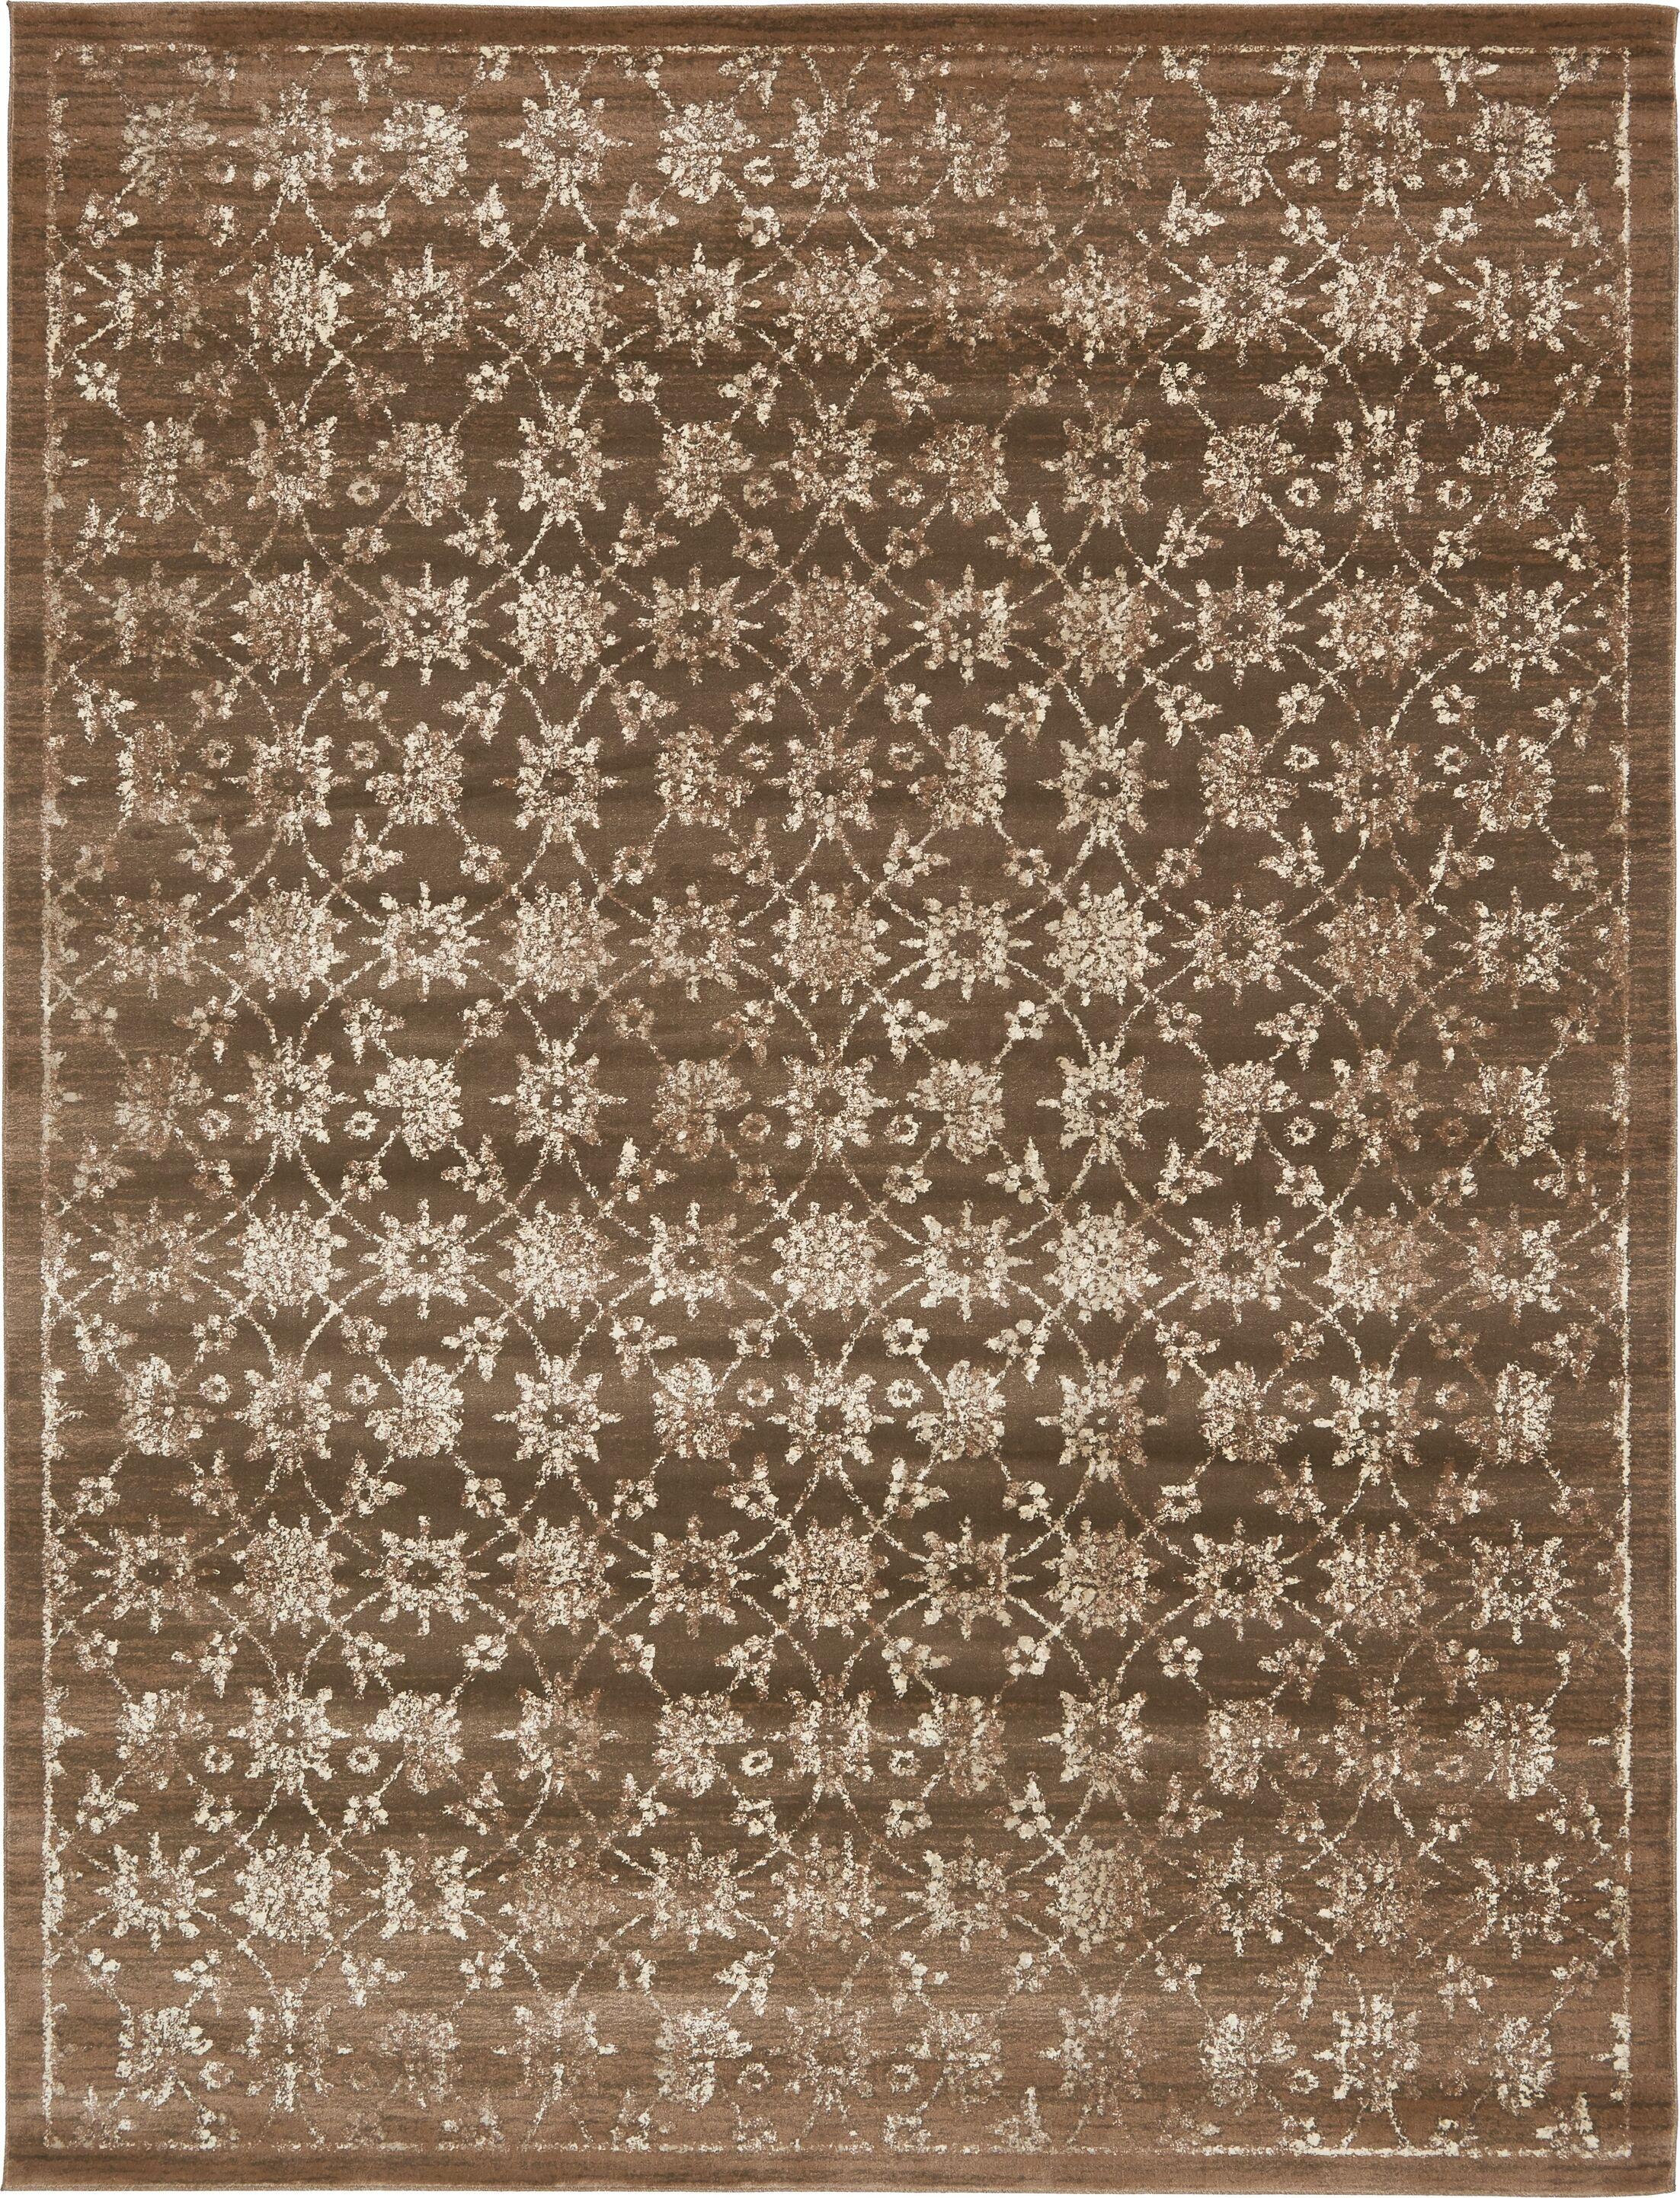 Geleen Brown Area Rug Rug Size: Rectangle 10' x 13'